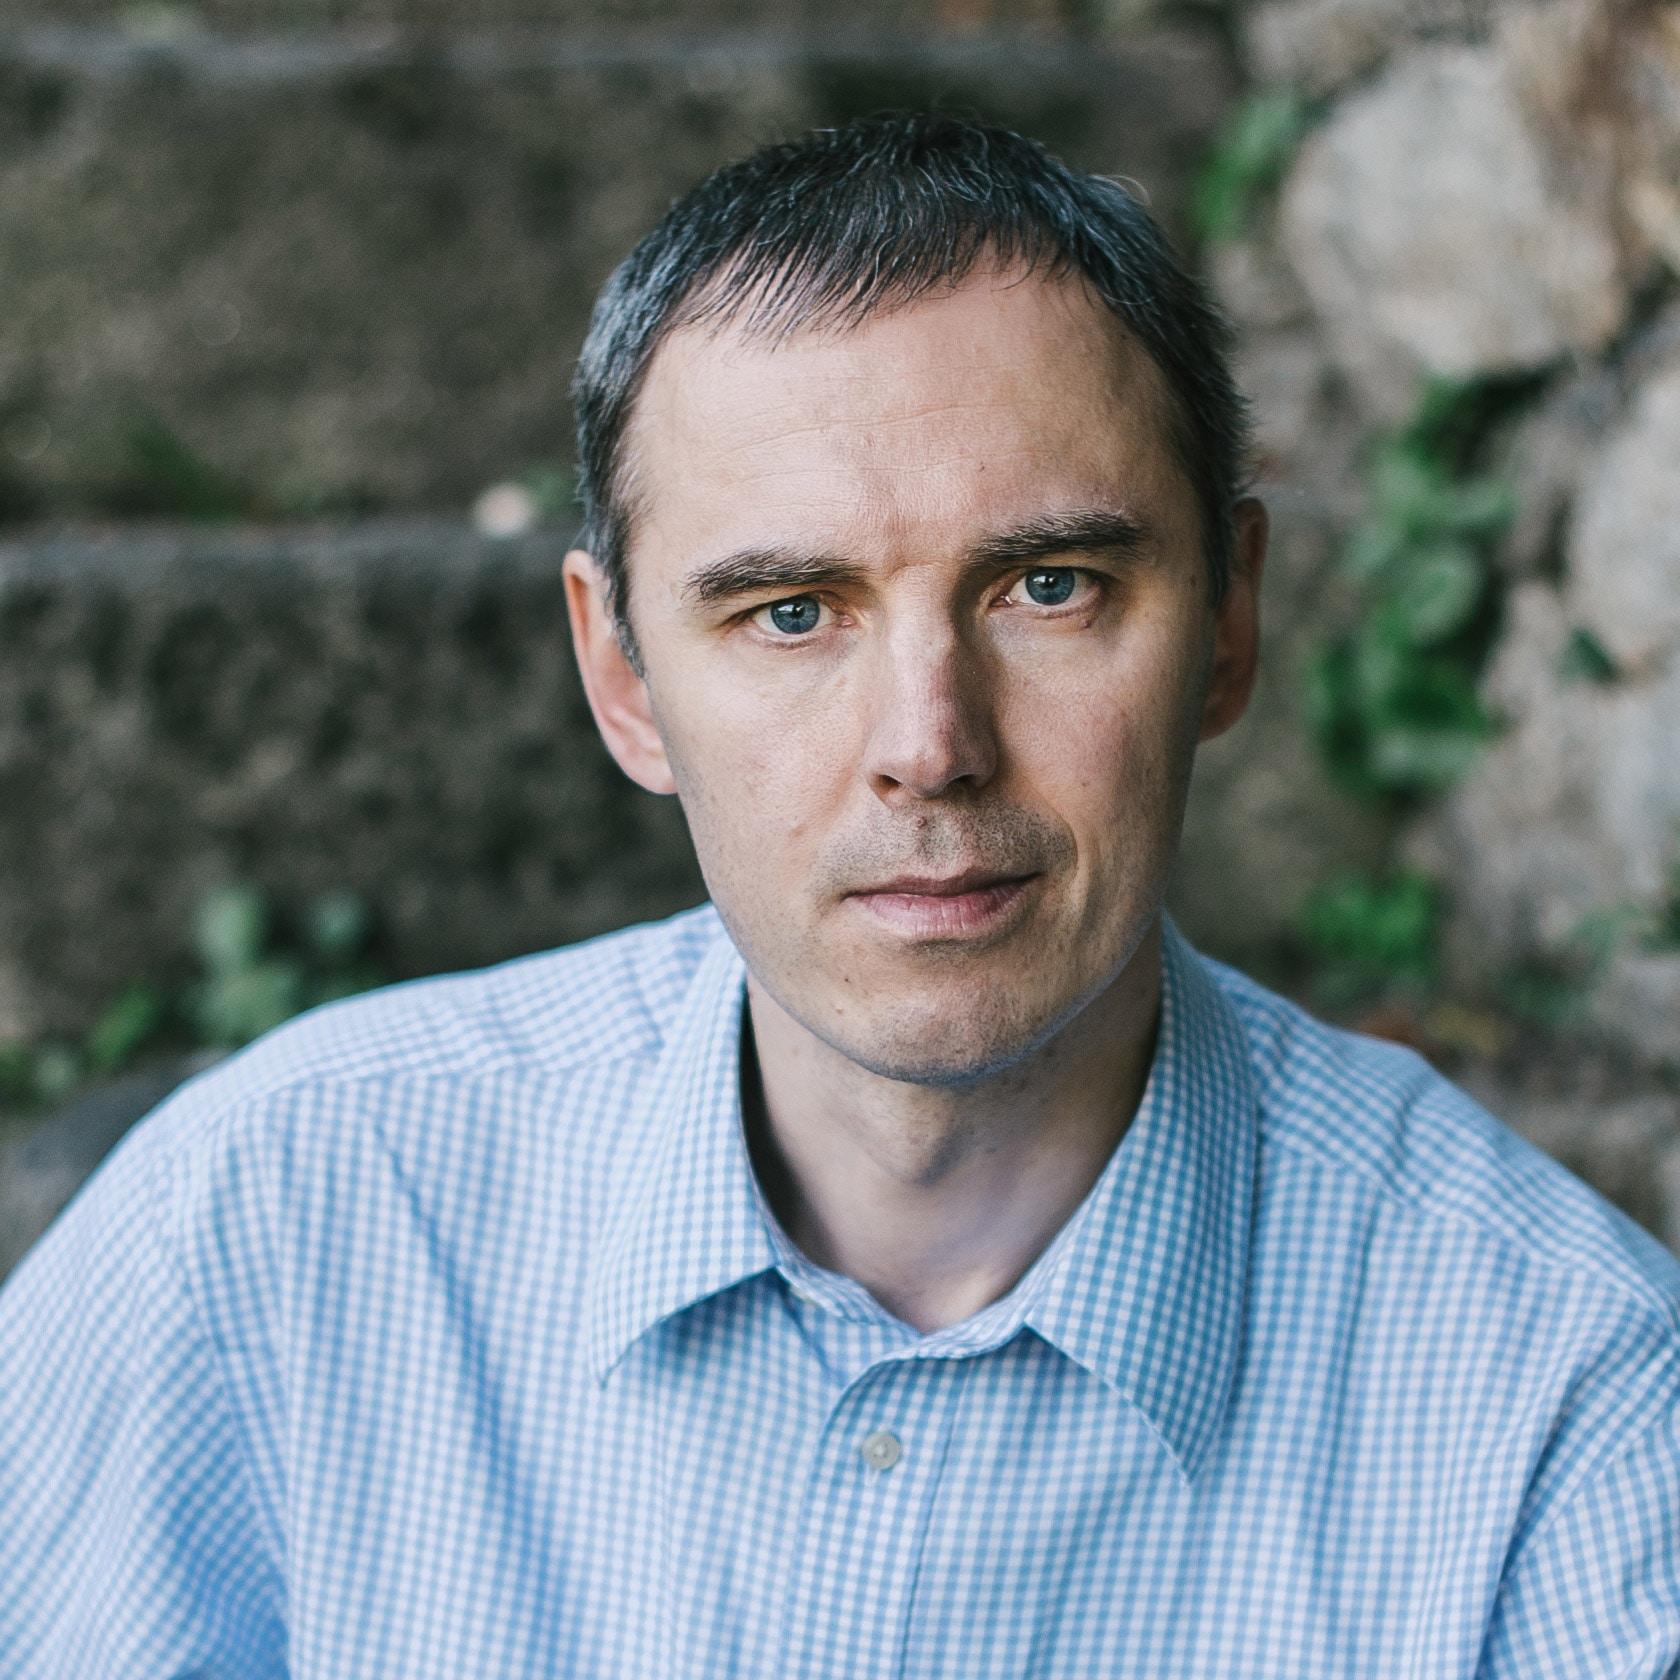 Avatar of user Maksym Kaharlytskyi